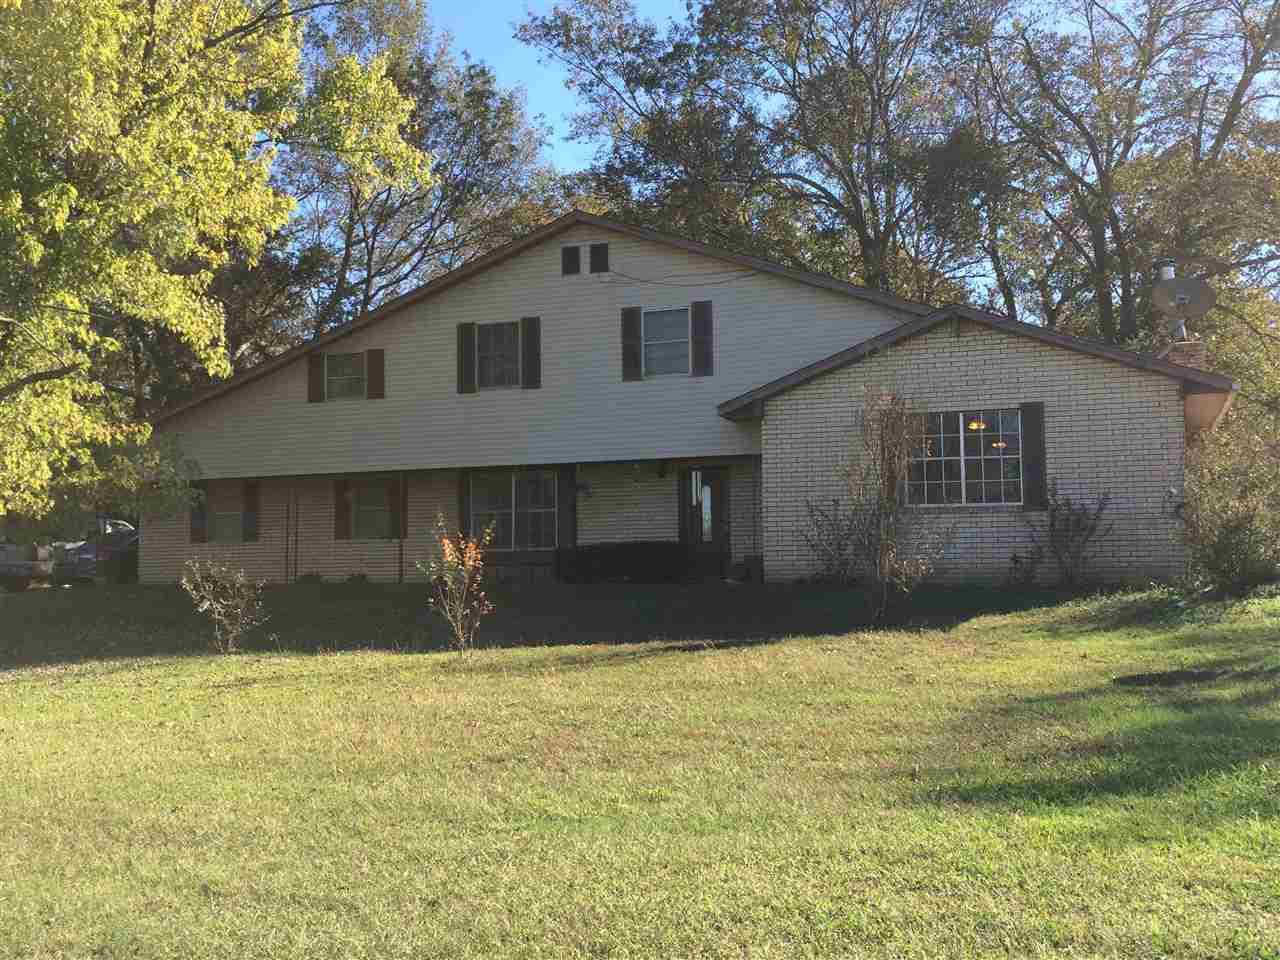 Real Estate for Sale, ListingId: 36278006, Caddo,OK74729